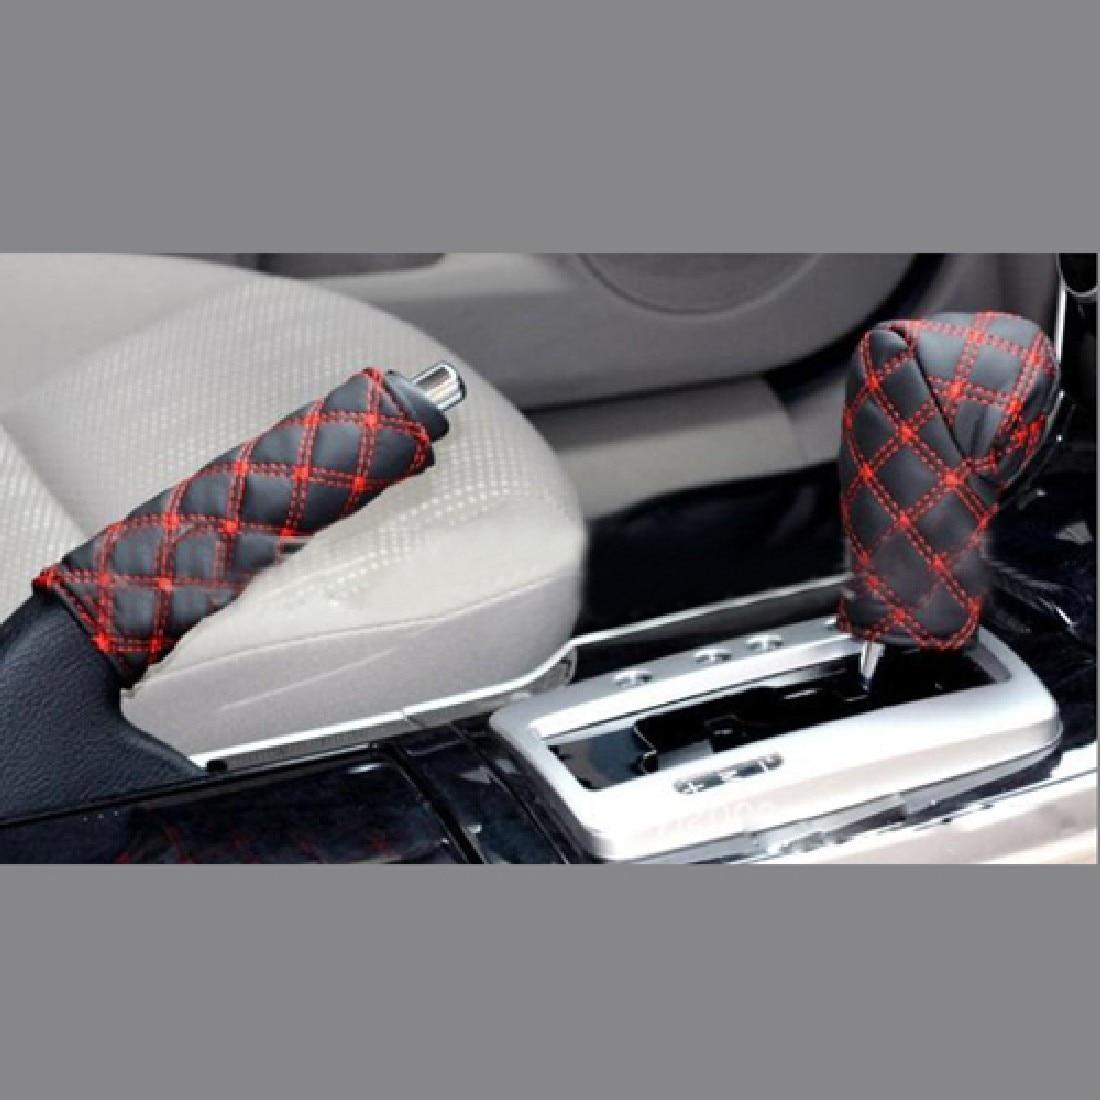 CAR-partment 1 Set/2pcs DIY Universal Grid Microfiber Auto Car Decoration Gear Set Hand Brake Case Holder Protectors Red White